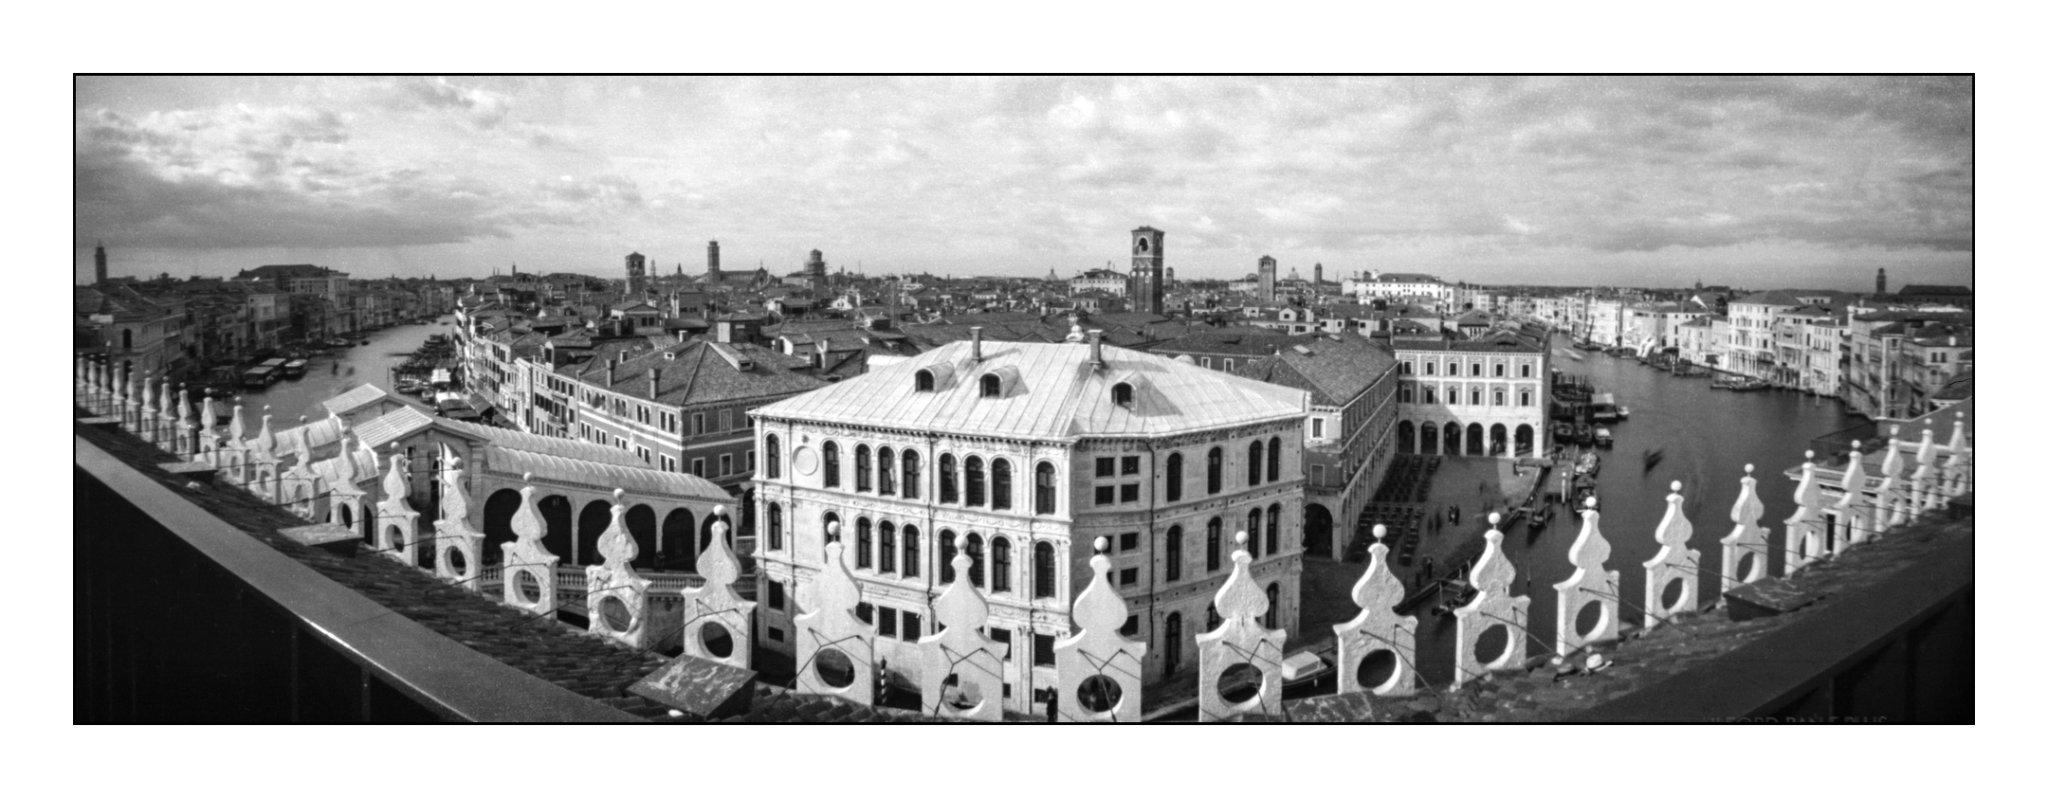 Lochkamera 16x7 analog: Venedig, Fotograf: Steffen Lohse